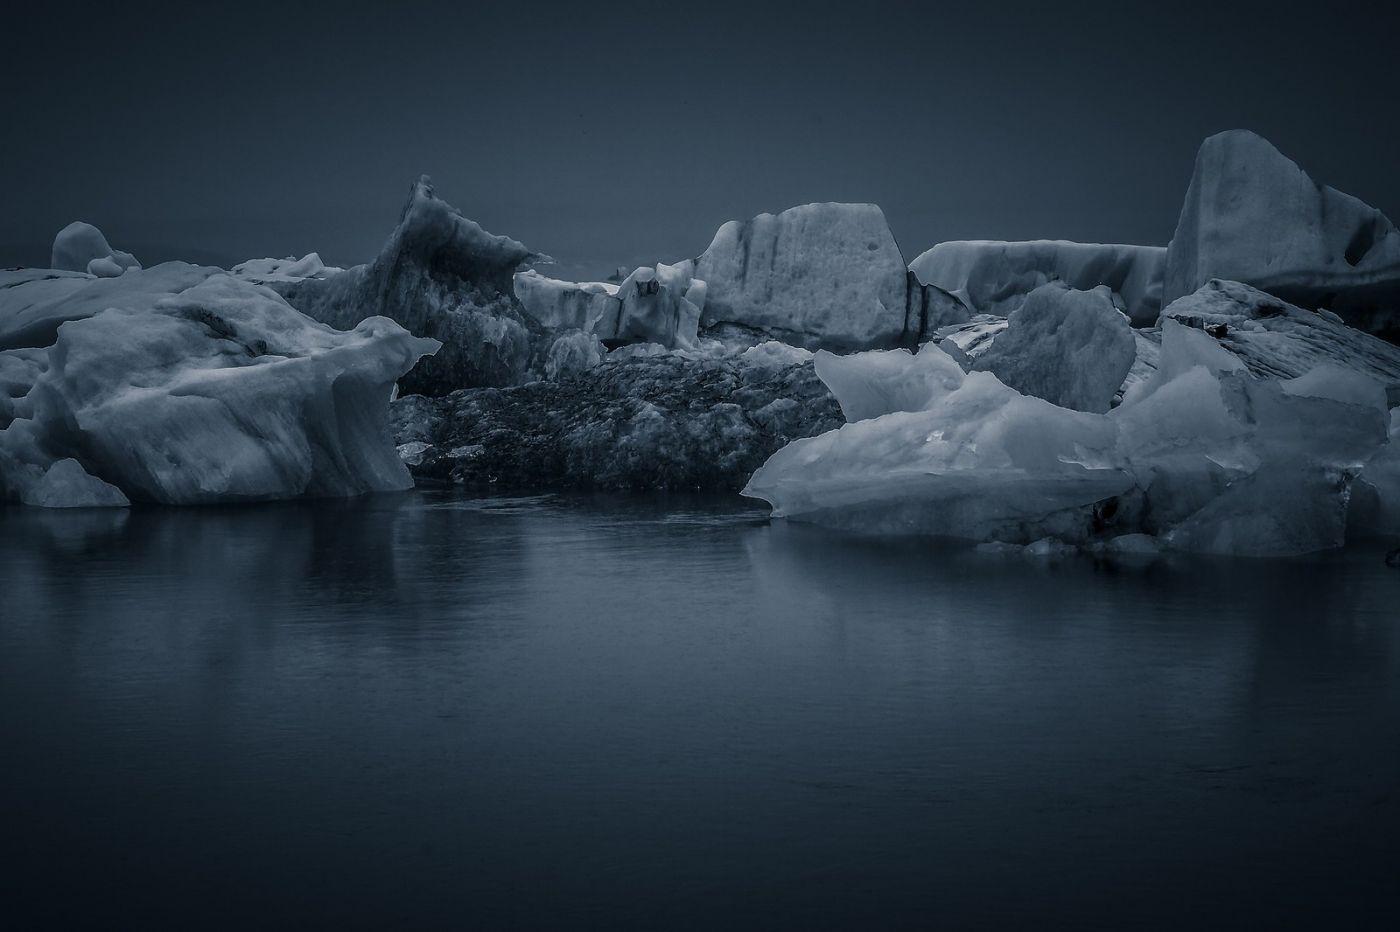 冰岛冰川泻湖(Glacier Lagoon),流动的冰川_图1-3